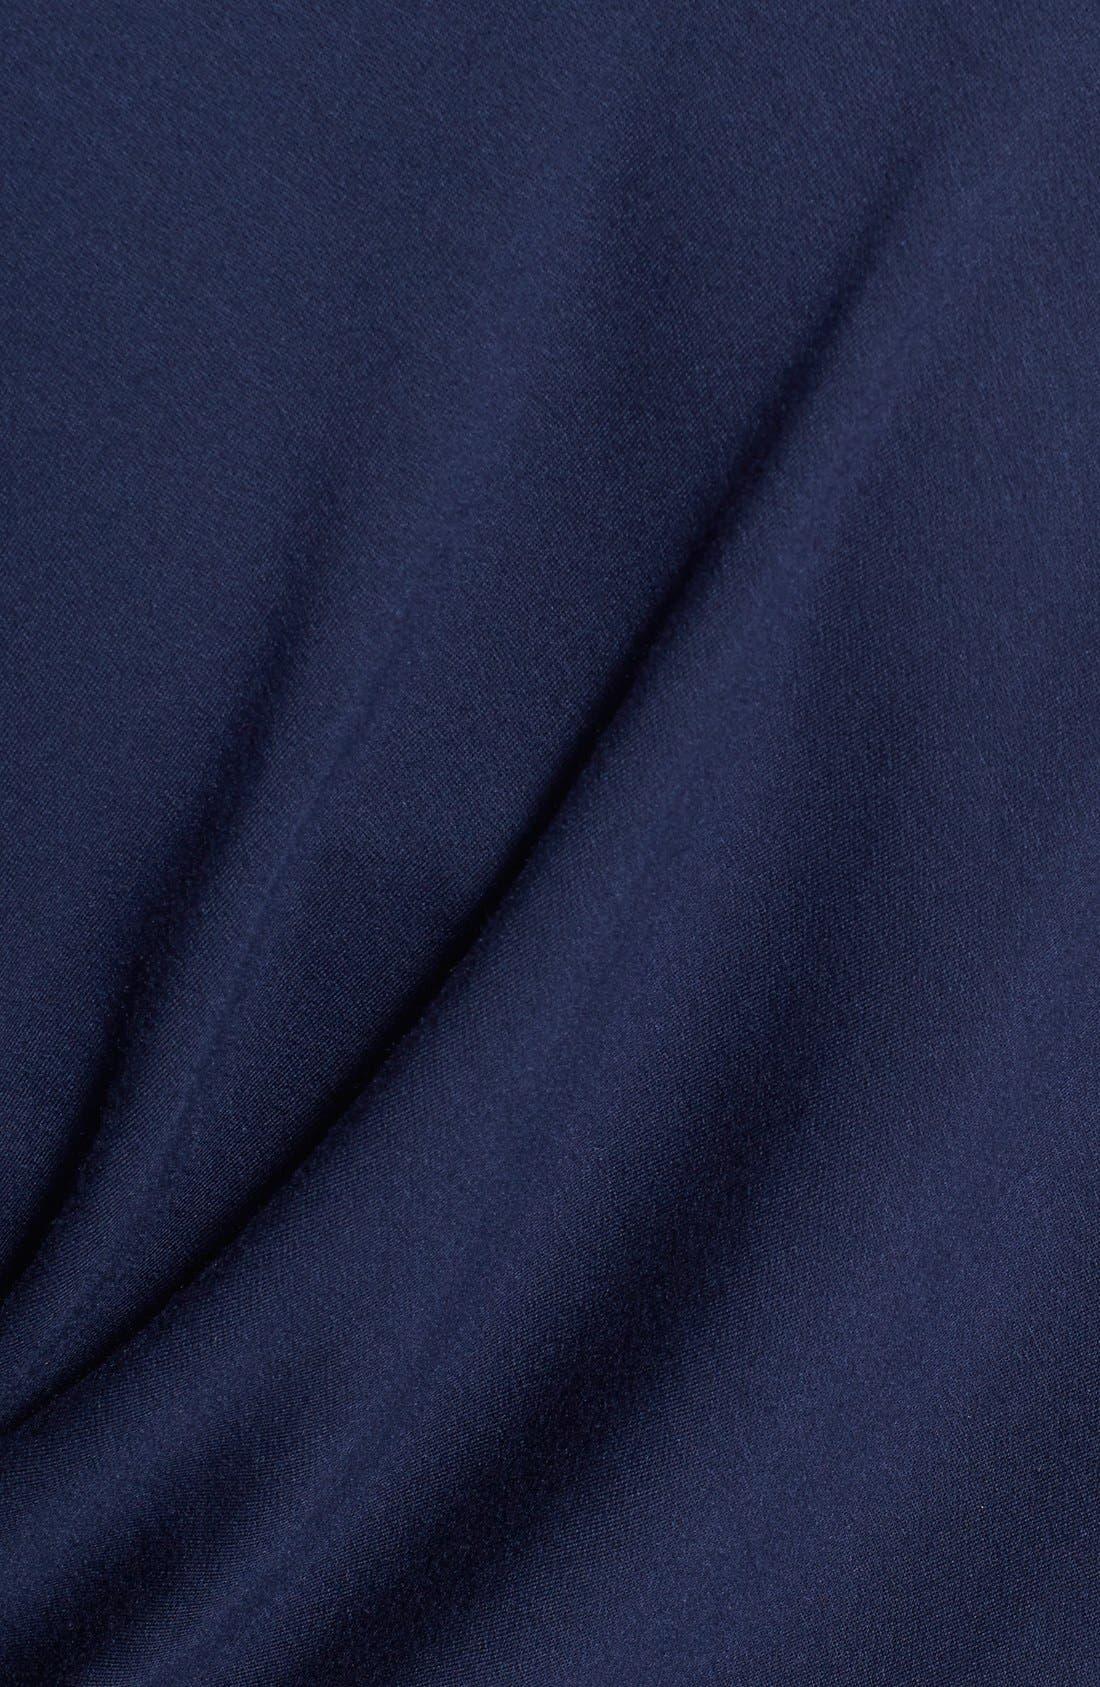 Alternate Image 3  - Tart Maternity 'Yvonne' Long Sleeve Maternity Sweatshirt